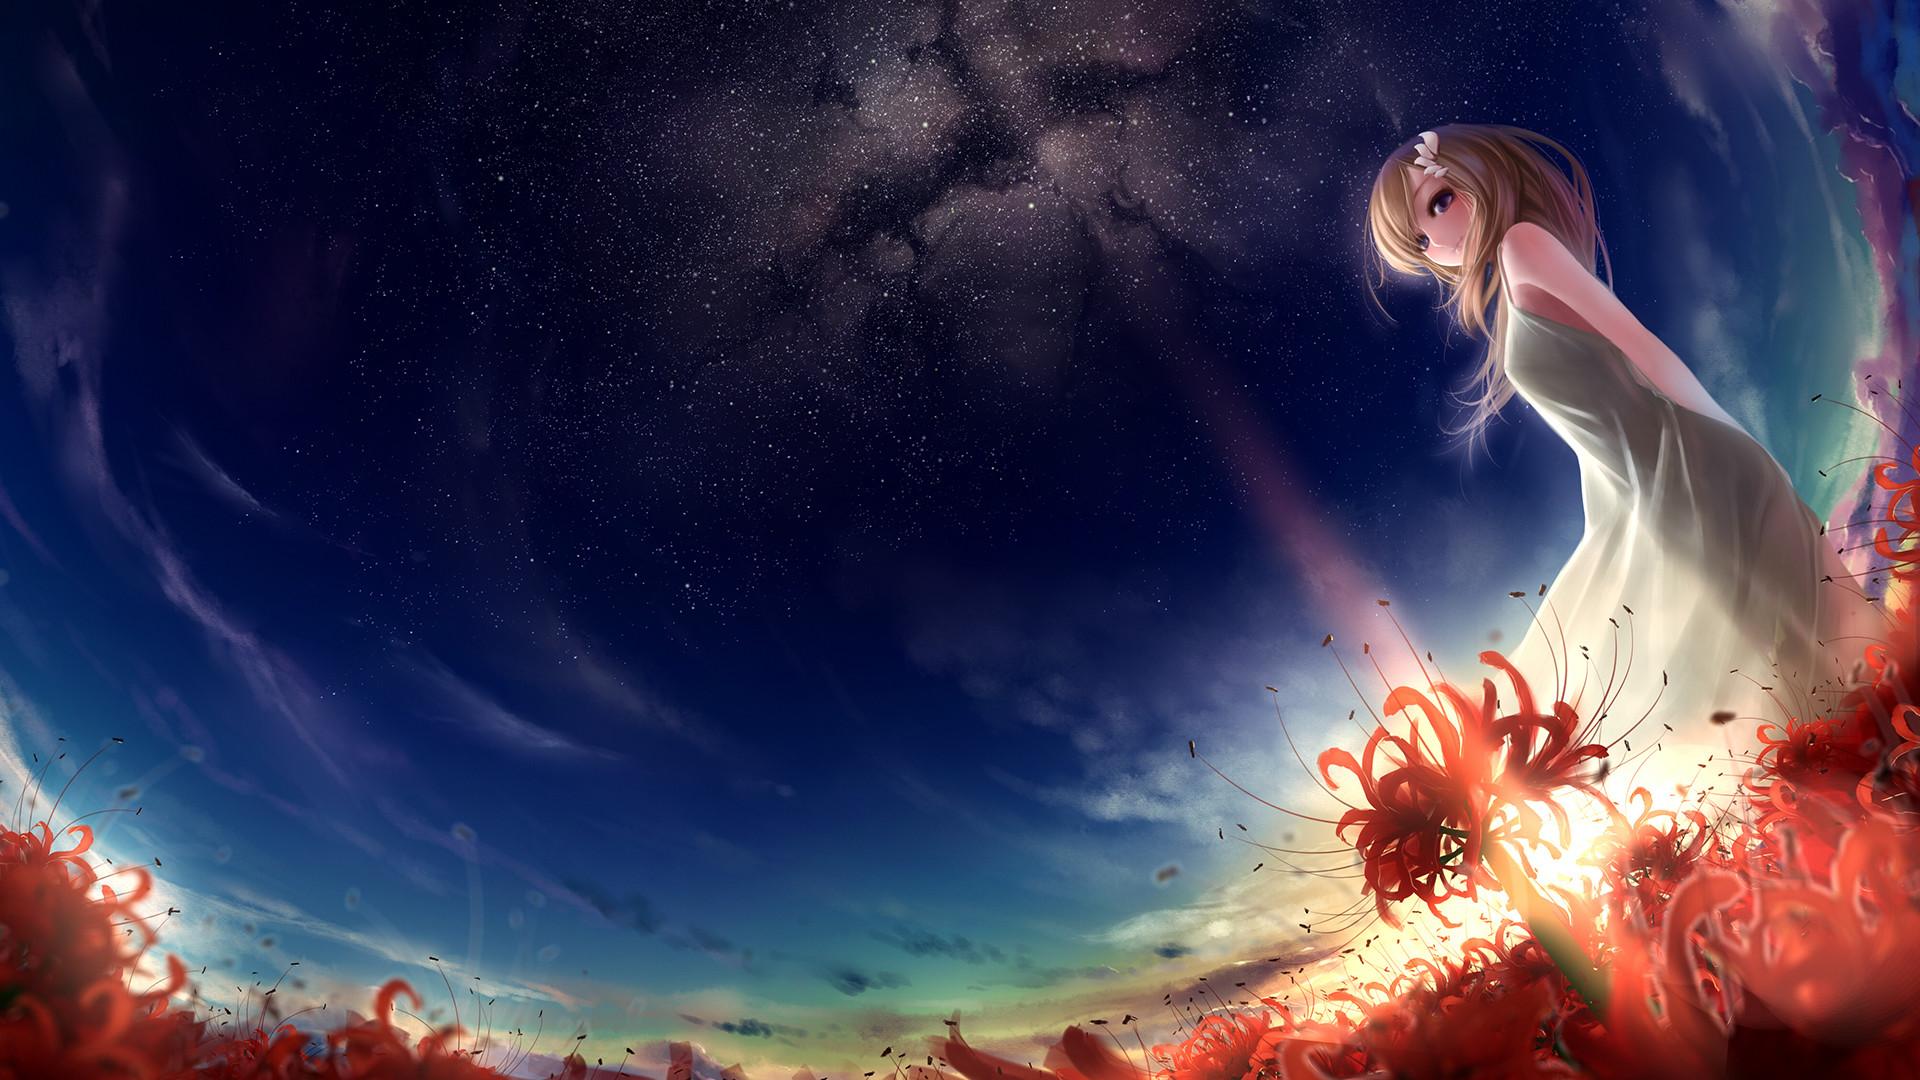 Anime Girls wallpapers: Enlightened by stars